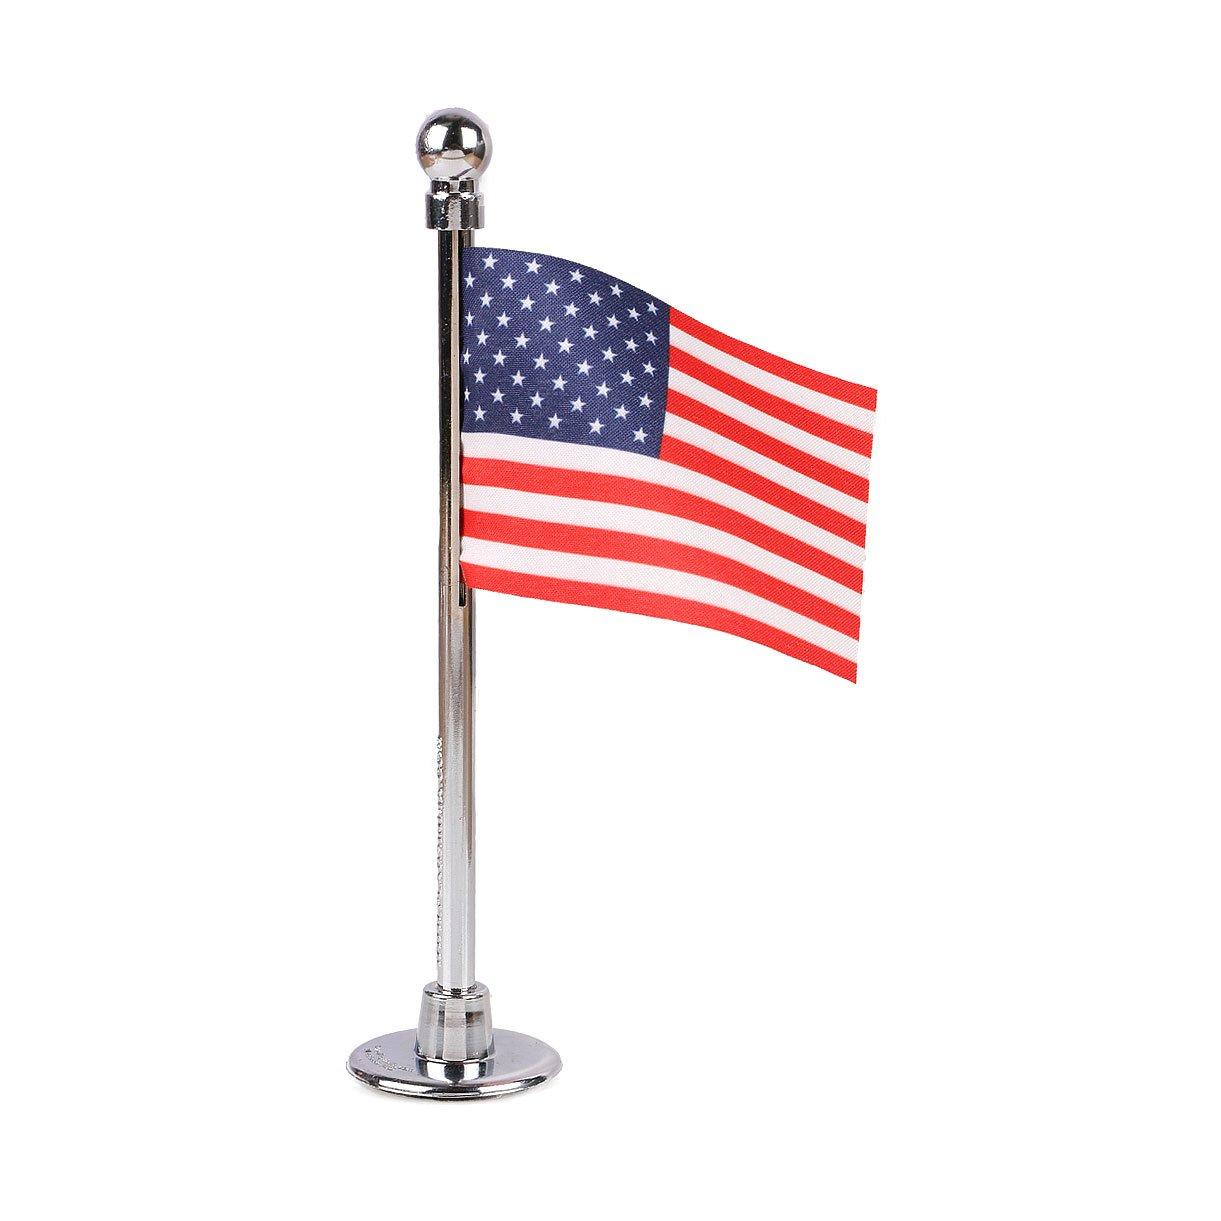 The Flag Shop USA Miniature Car Dashboard Flag with A Nano Chrome-Plated Plastic Base